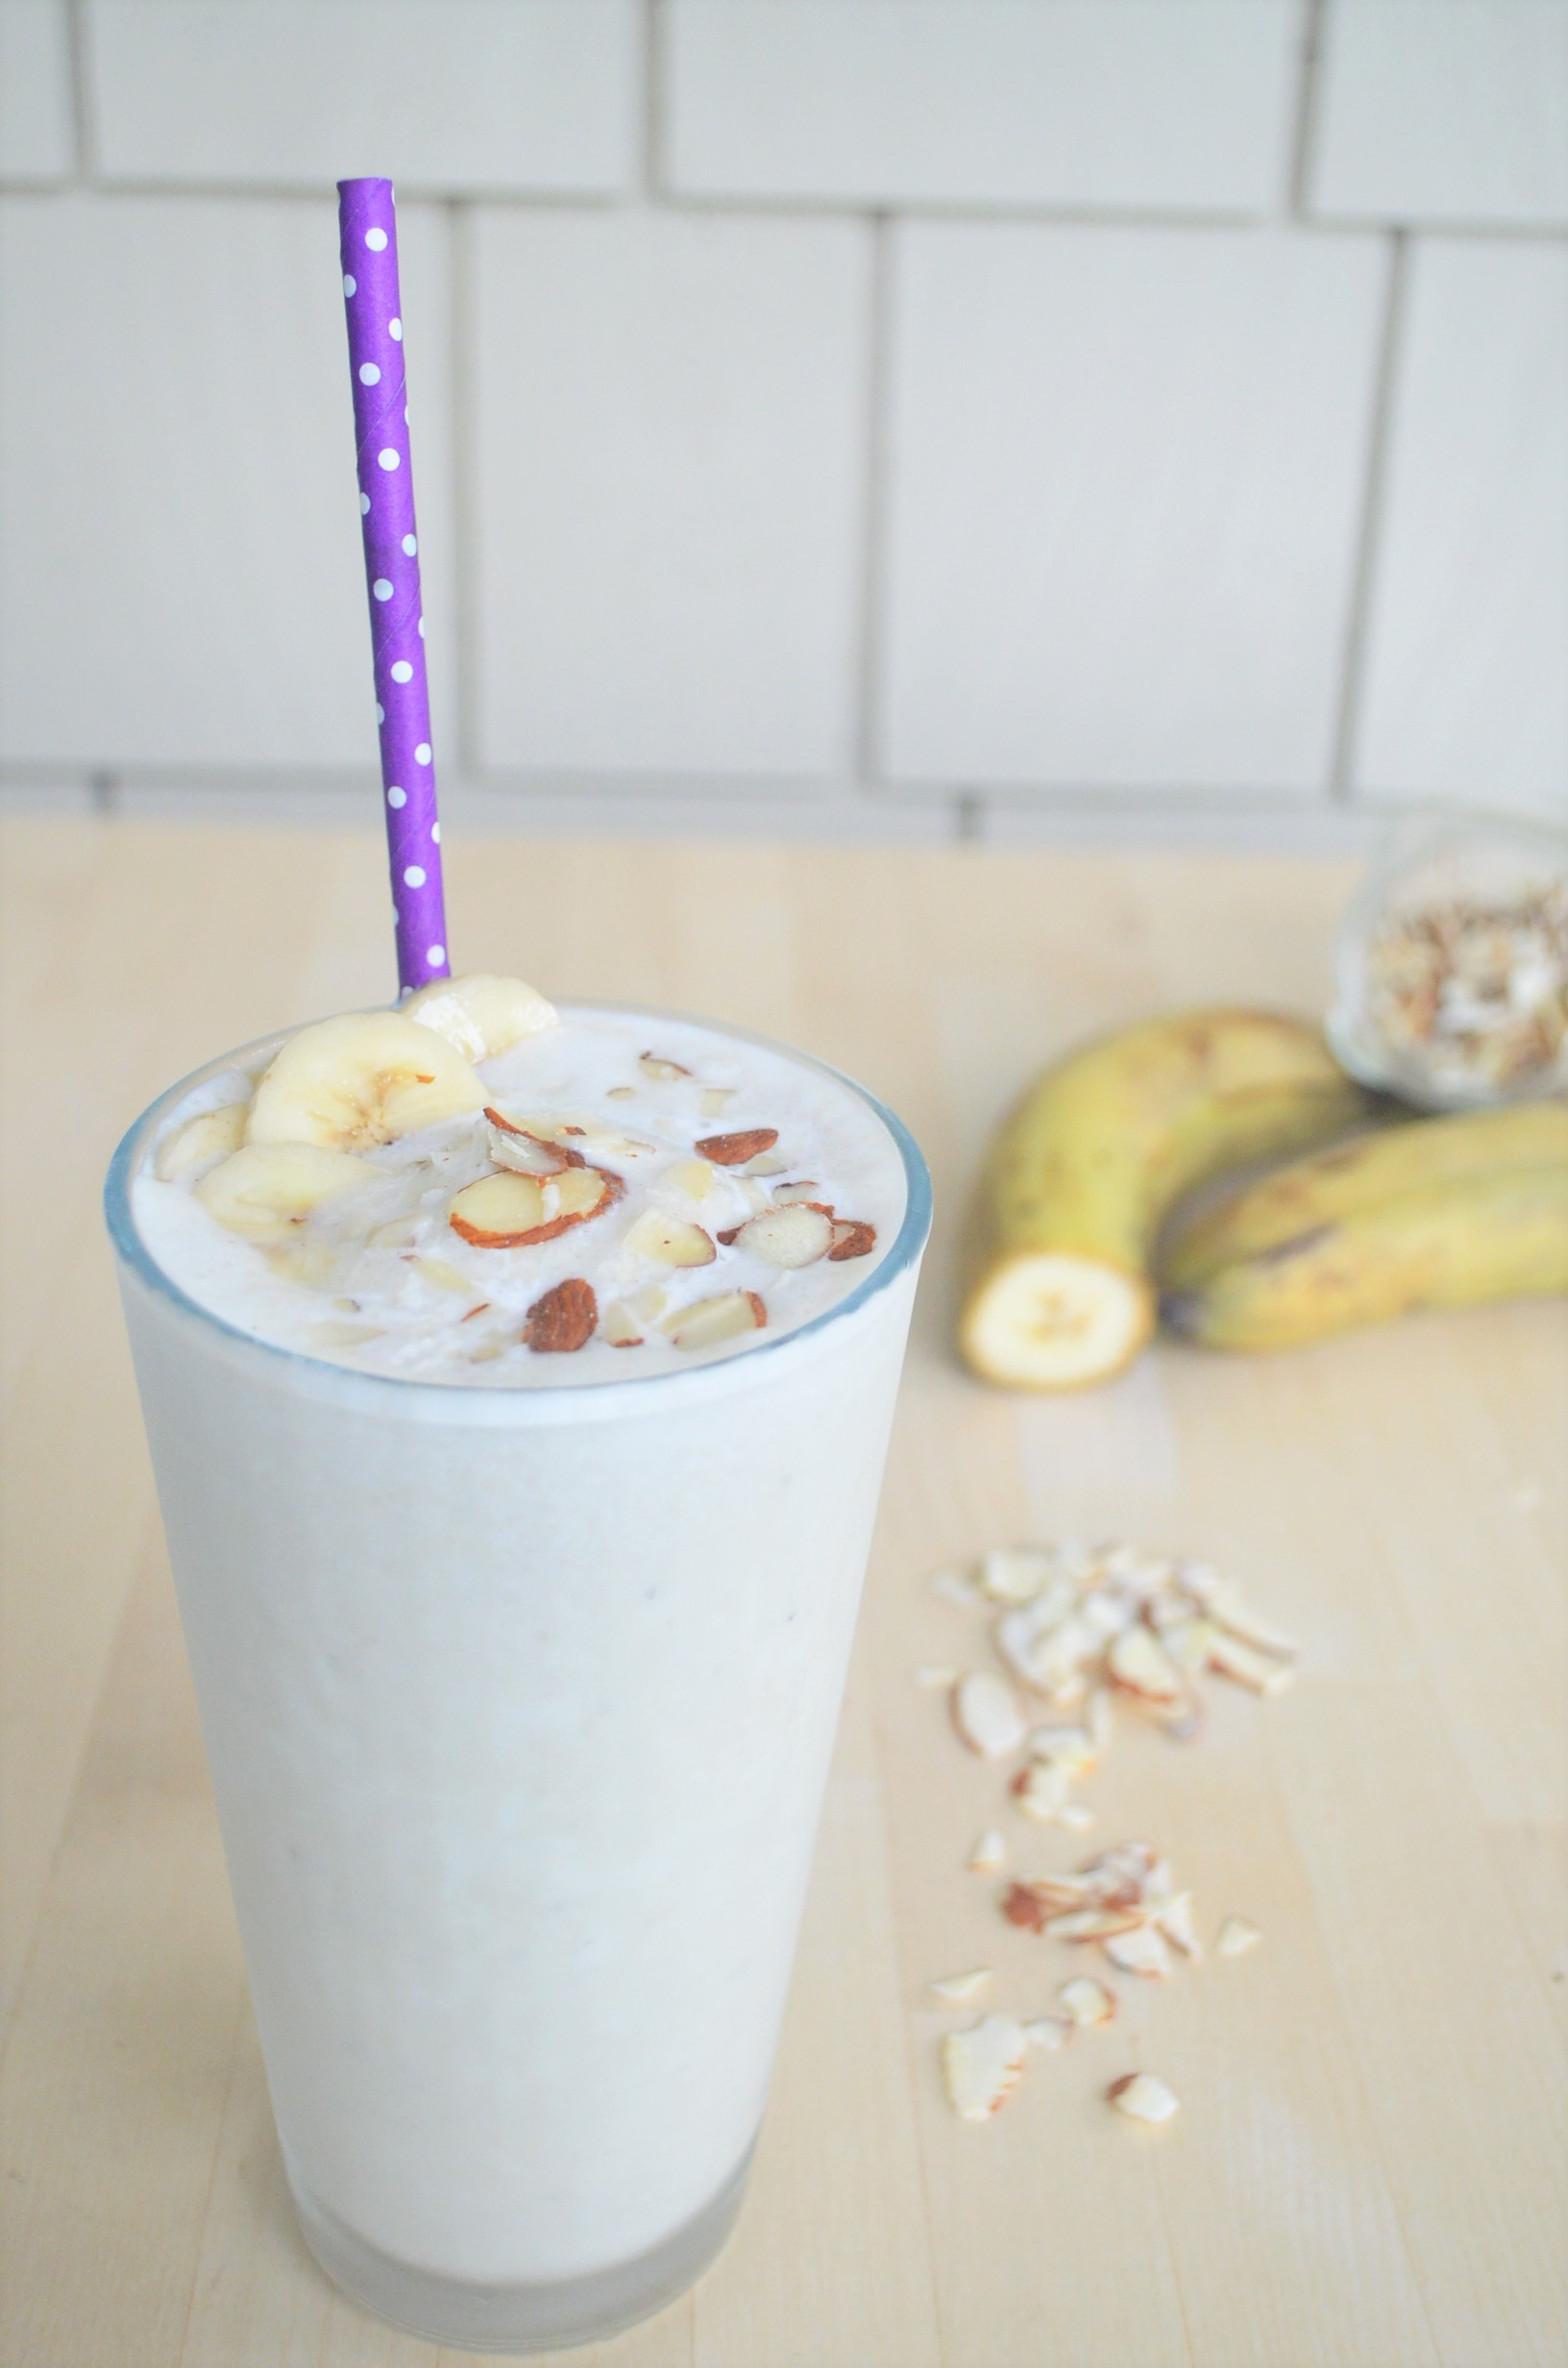 Banana Yogurt Smoothie For One